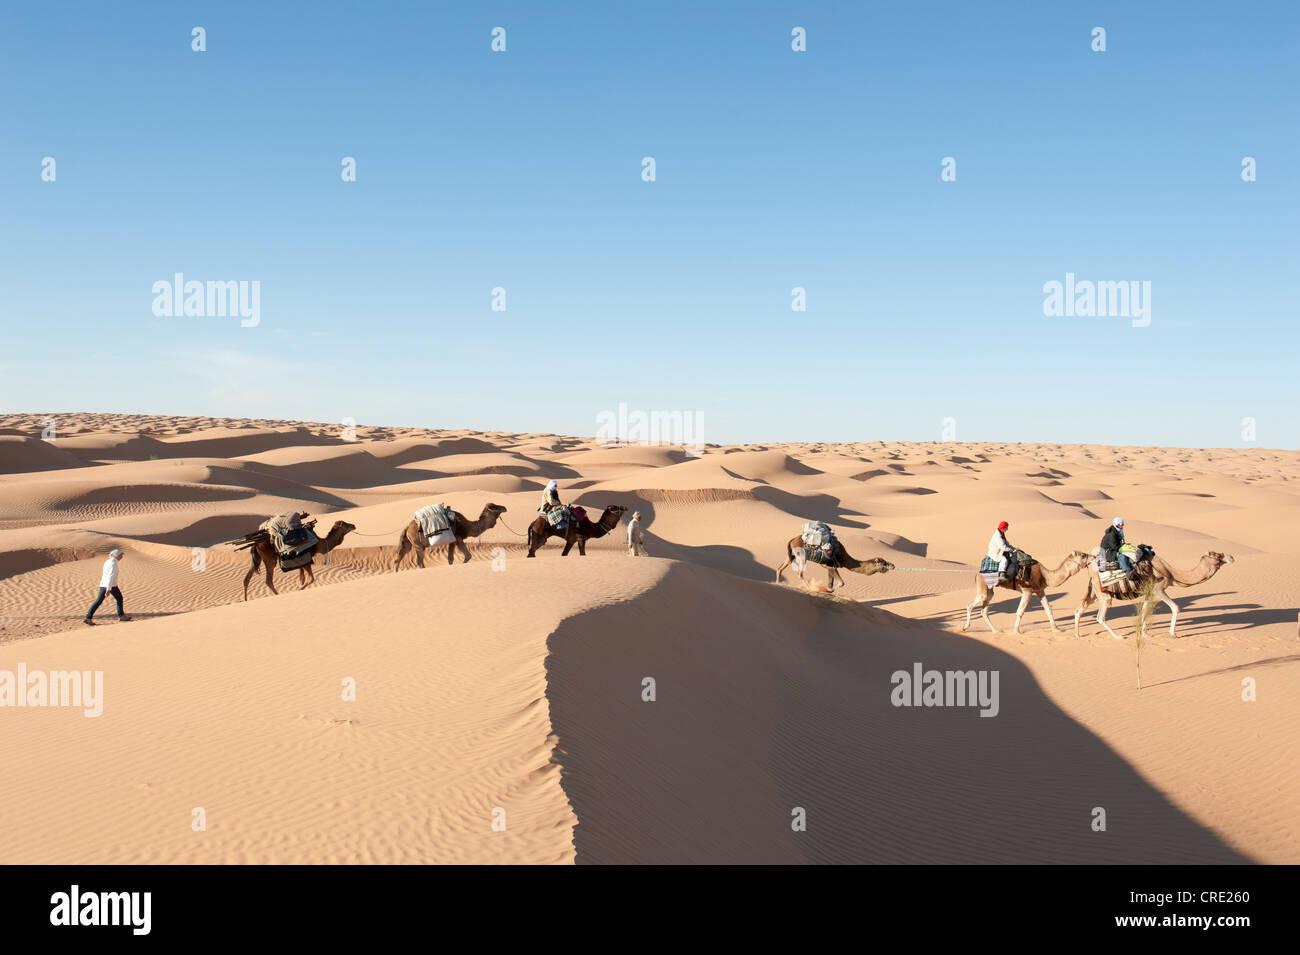 Sustainable tourism, camel trekking, camels, dromedaries (Camelus dromedarius), sand dunes, Sahara desert between - Stock Image